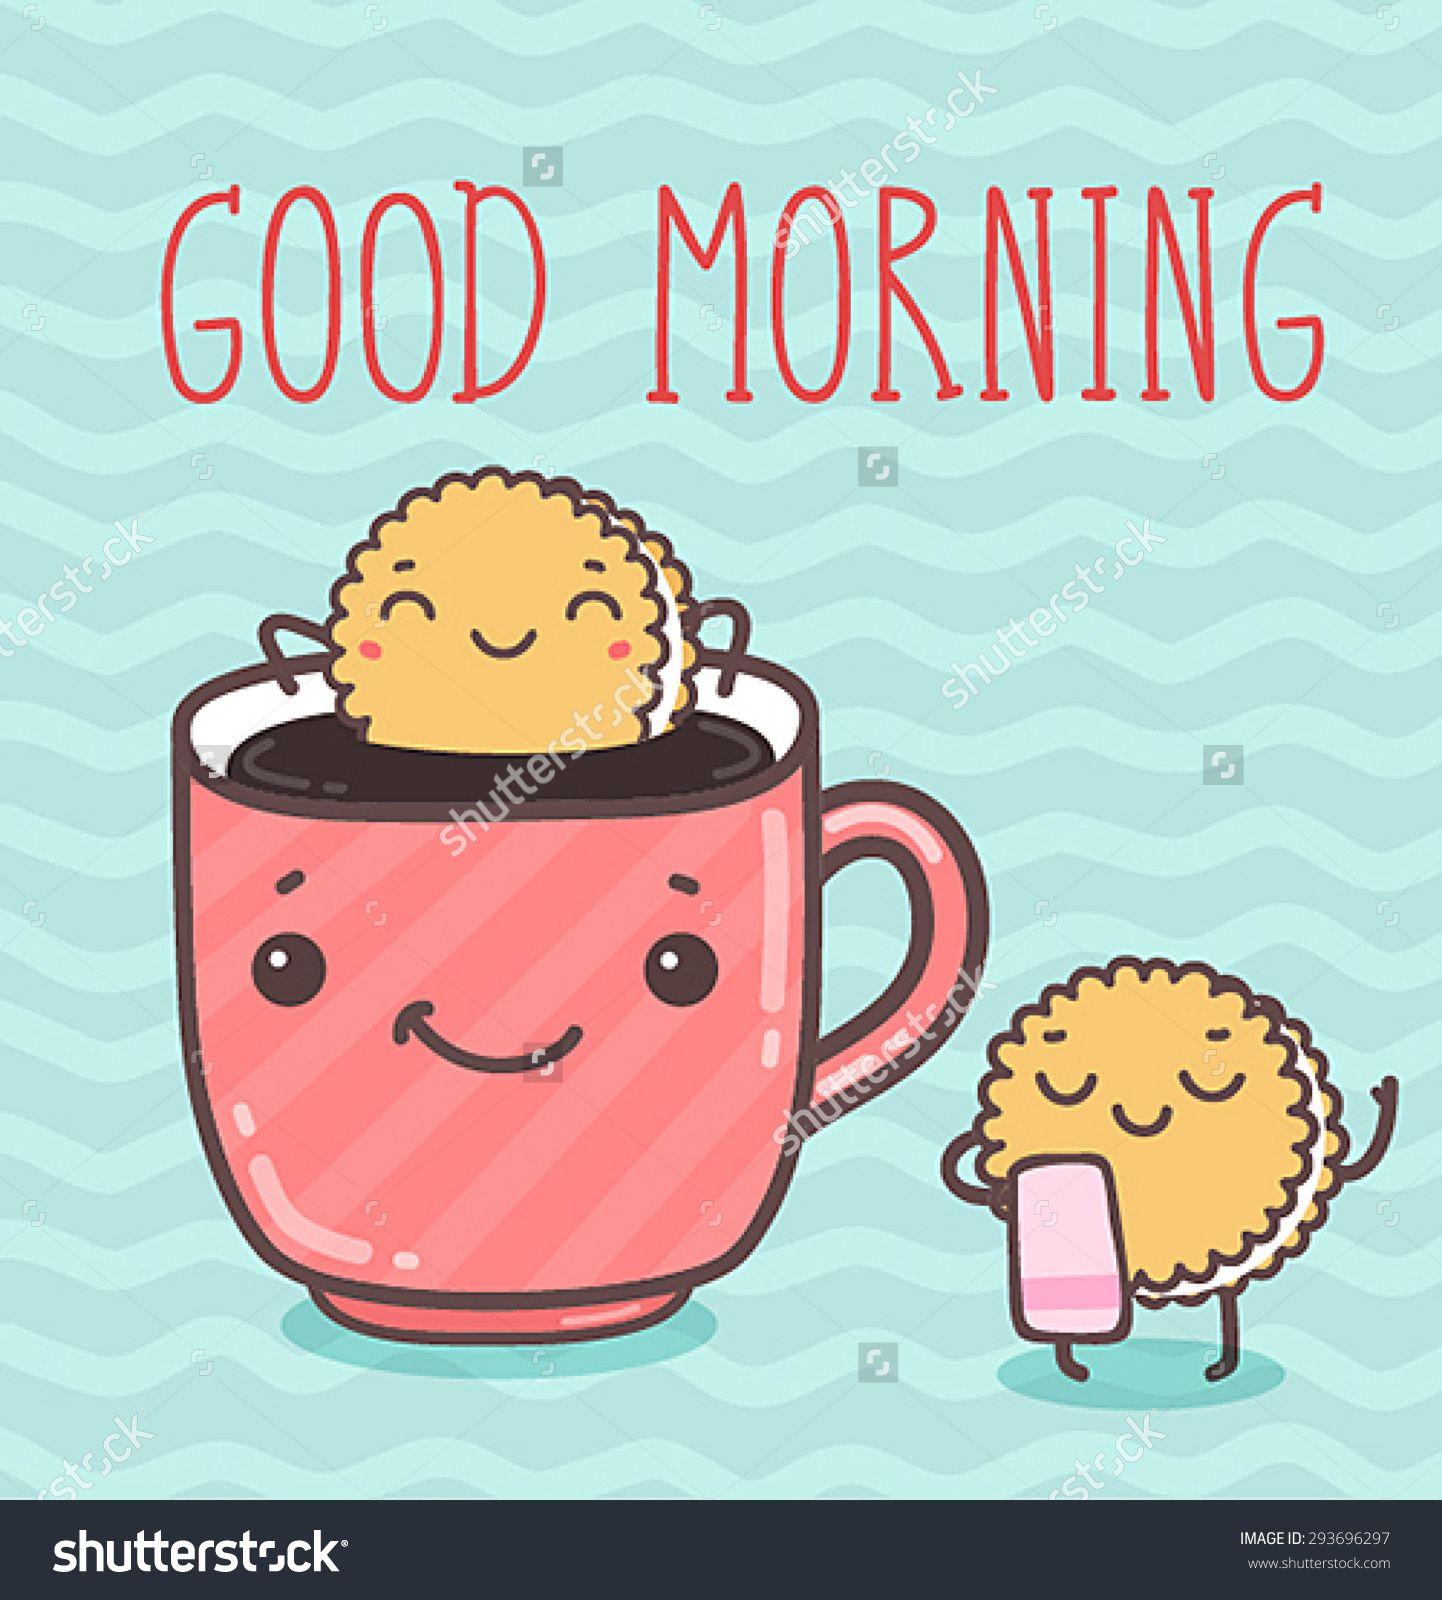 Good Morning Clipart saturday.